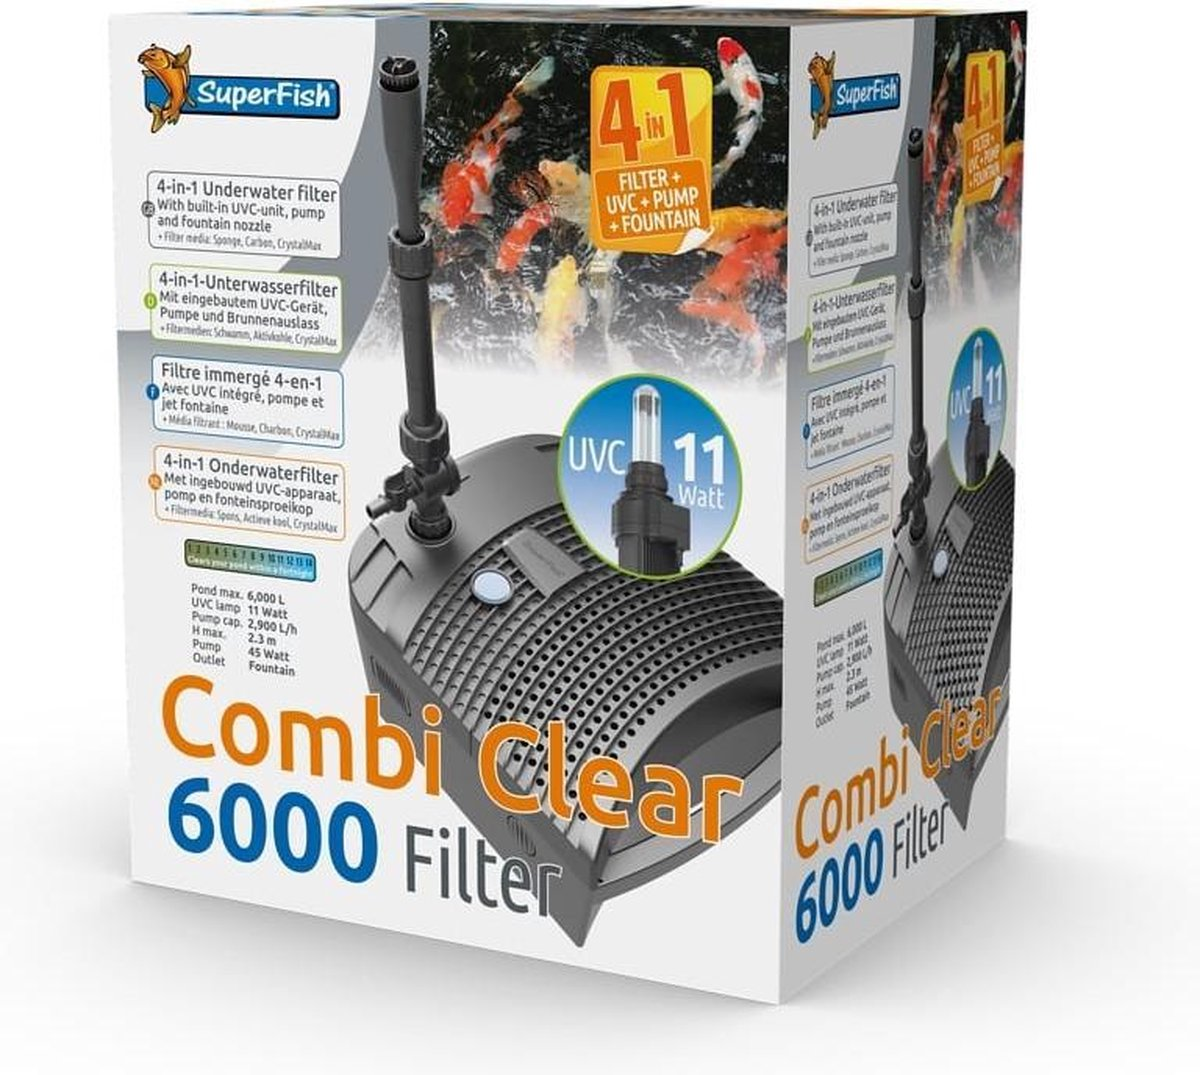 Superfish Combi Clear 6000 - uvc 11 watt - 2900 l/uur kopen